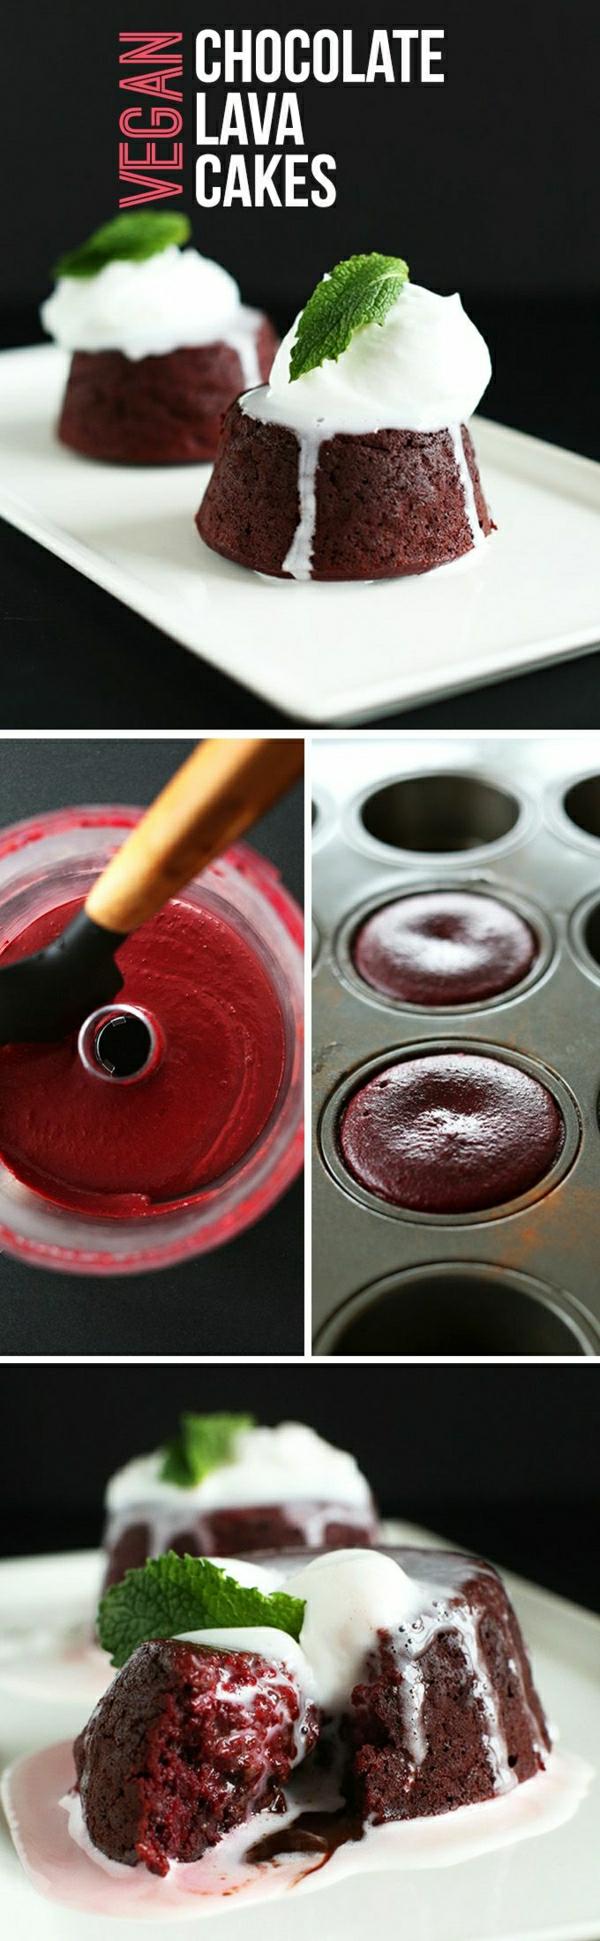 moelleux-au-chocolat-art-culinaire-resized